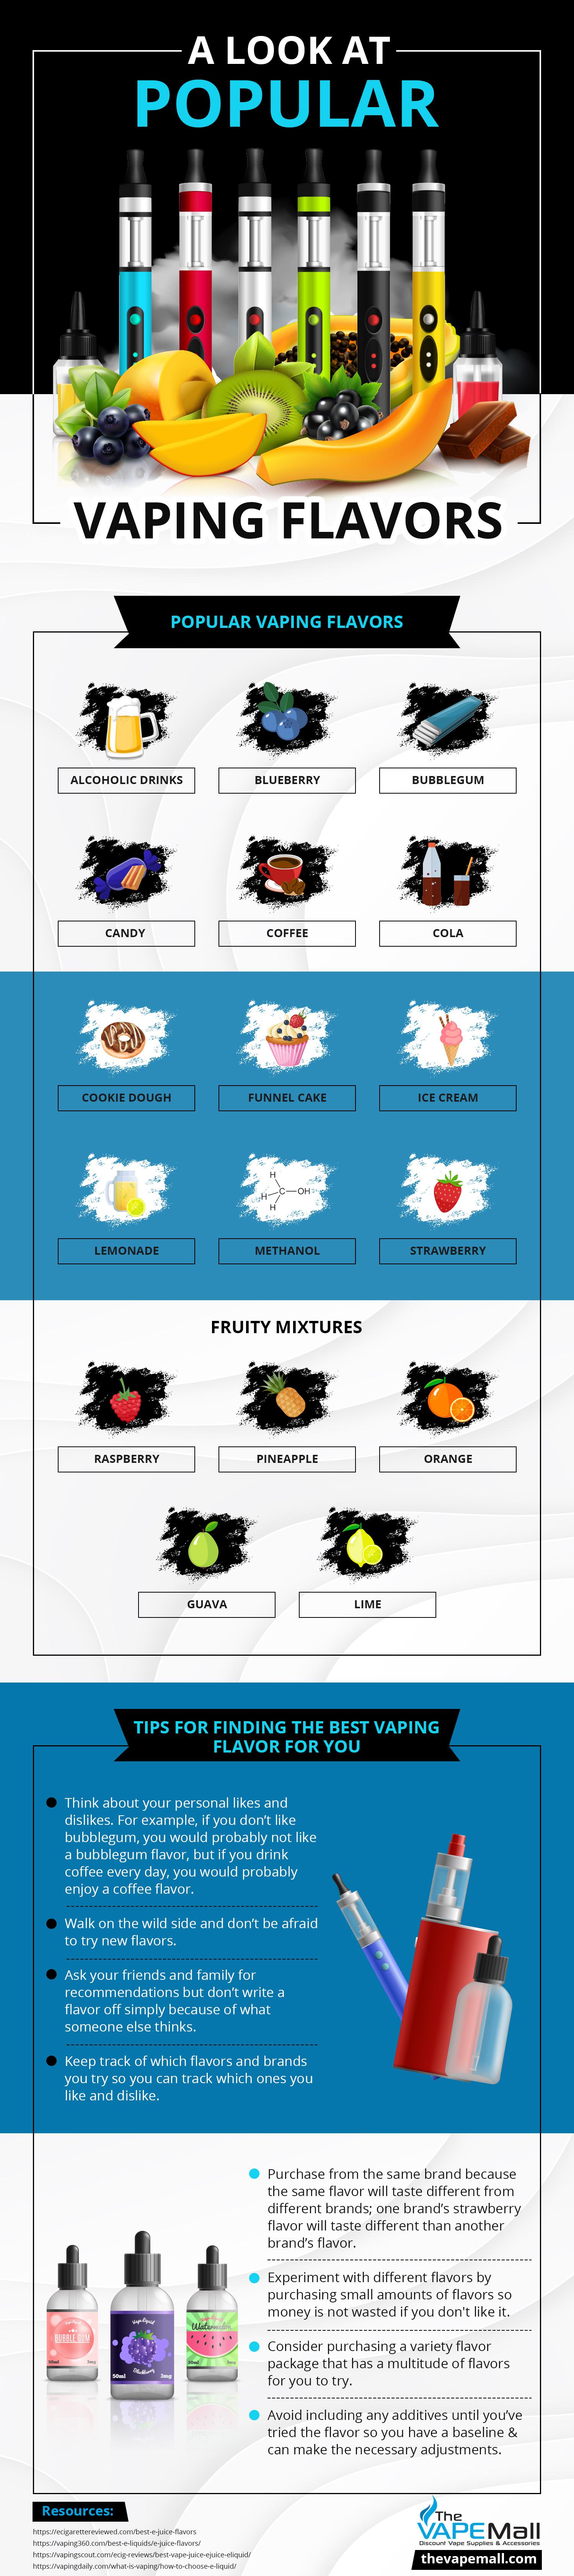 a-look-at-popular-vaping-flavors.jpg